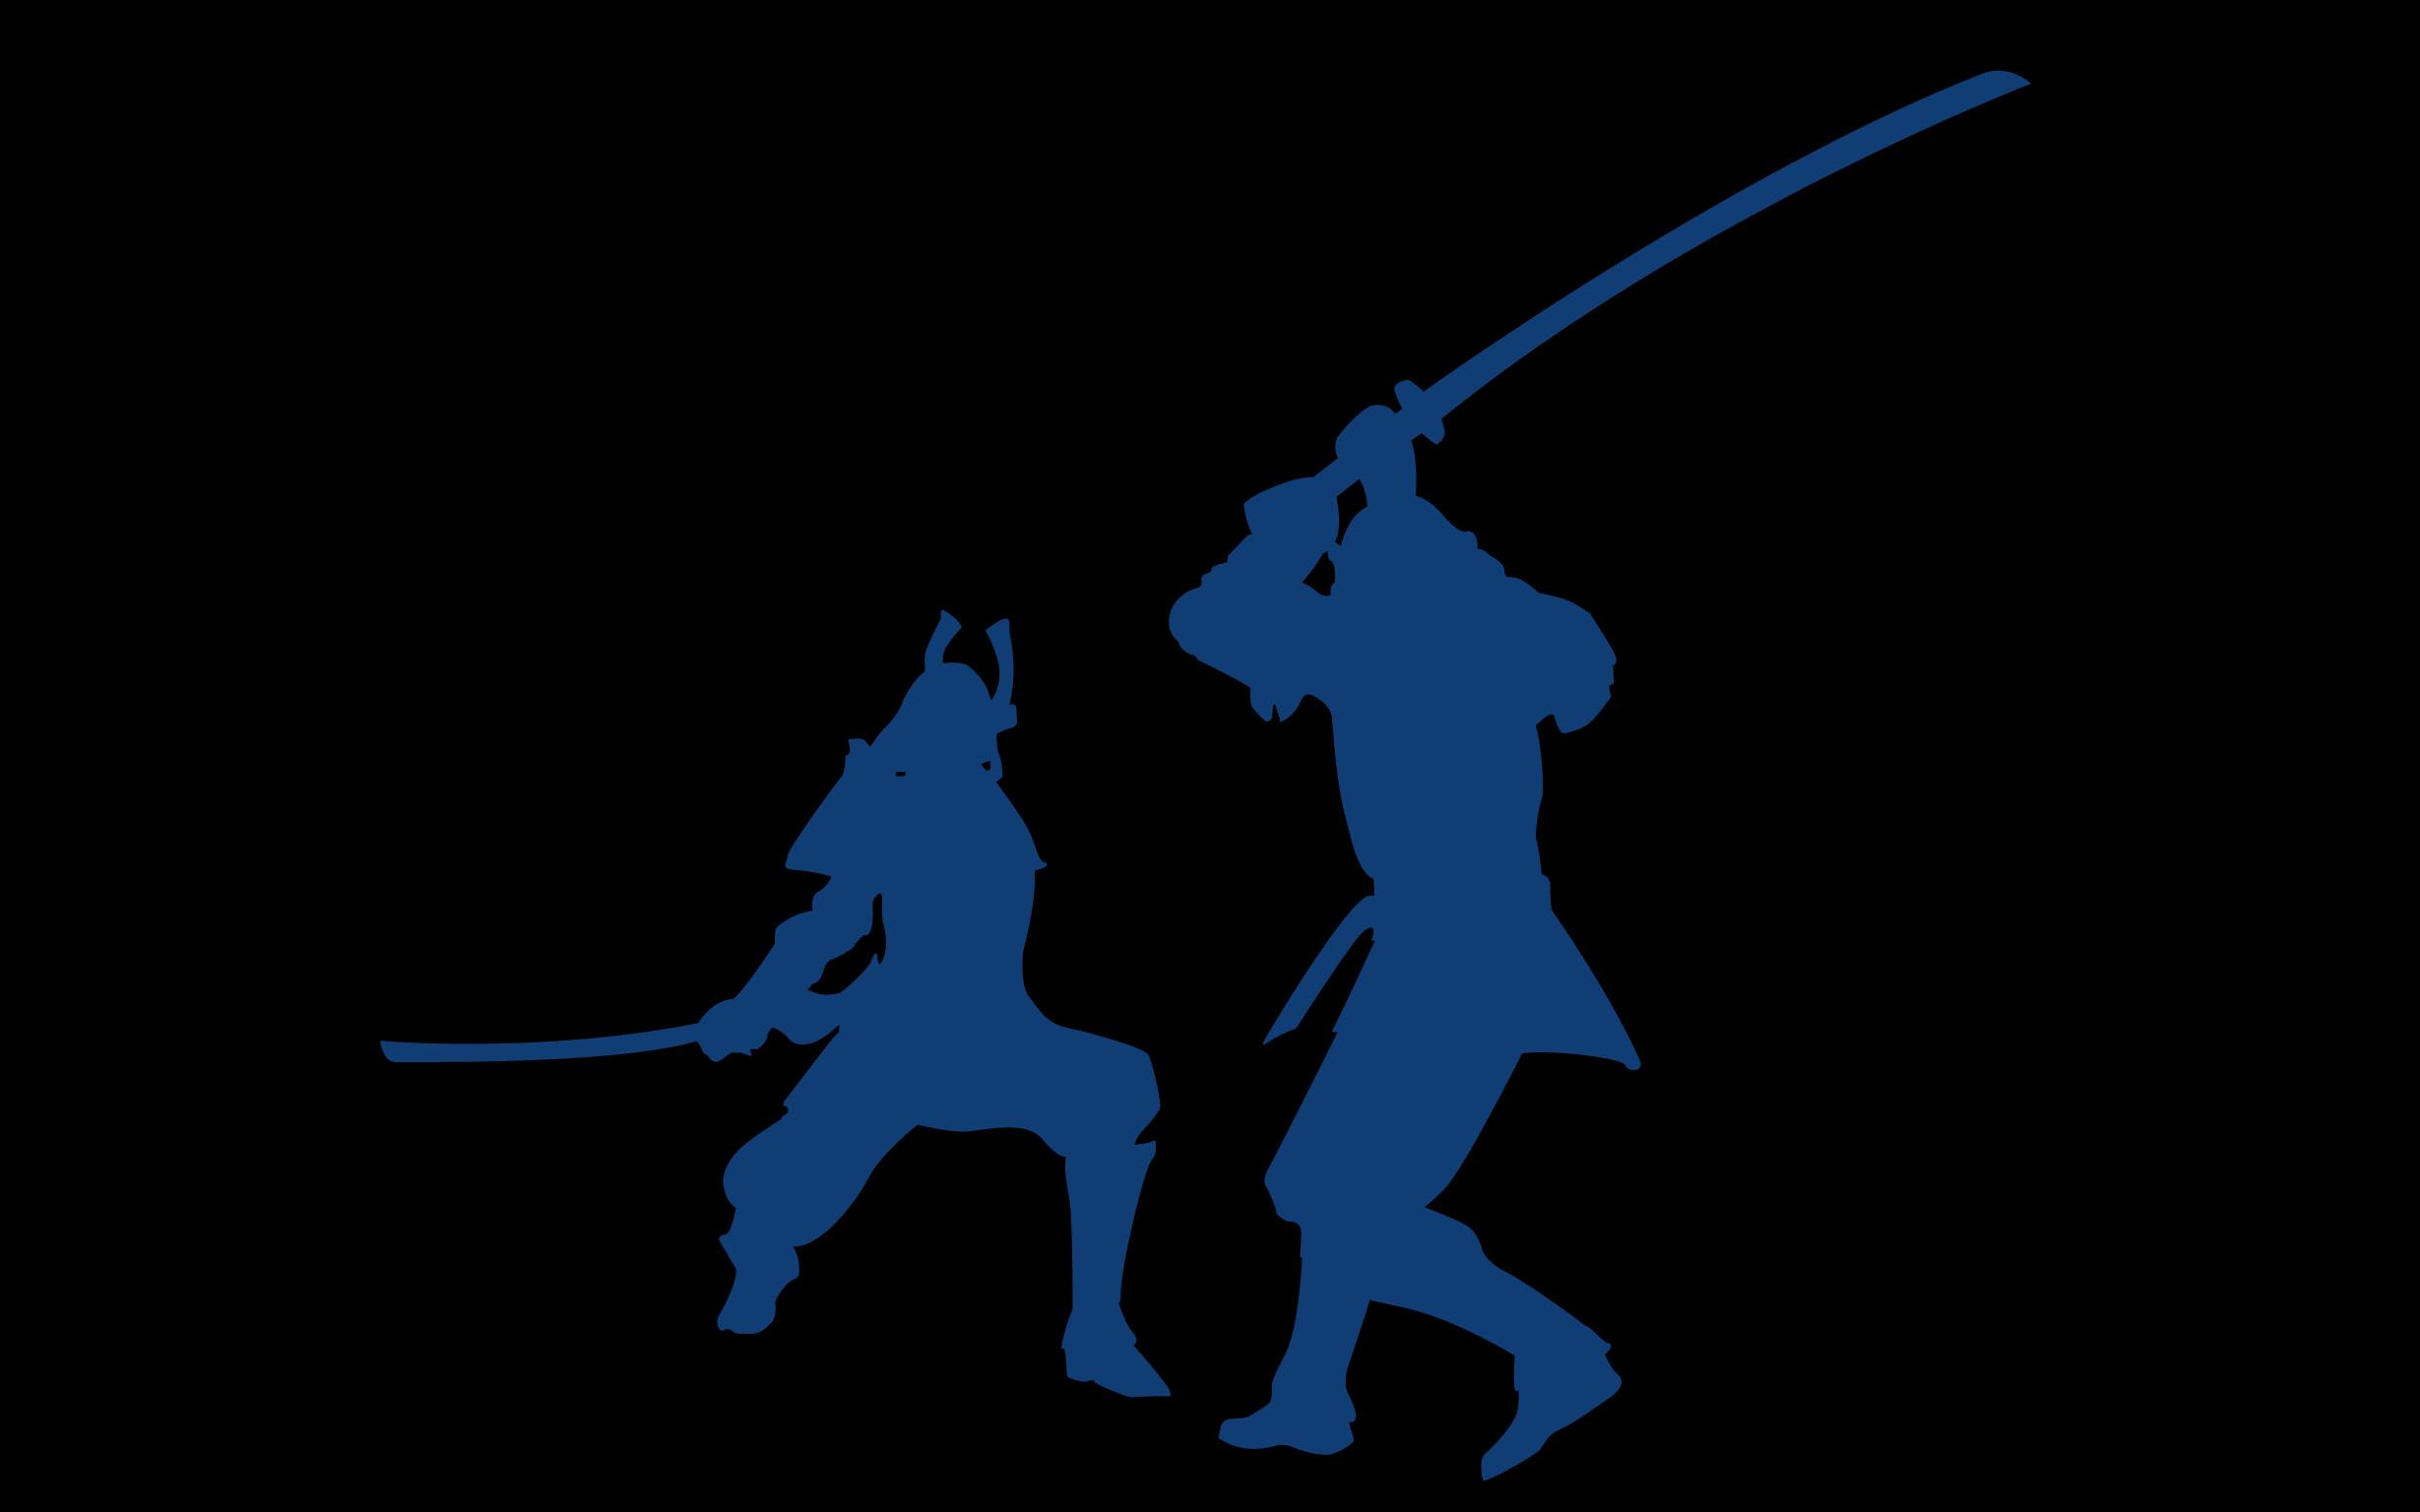 Link, Ganondorf, Samurai, Yu Yu Hakusho, Samurai Jack, Assassins Creed,